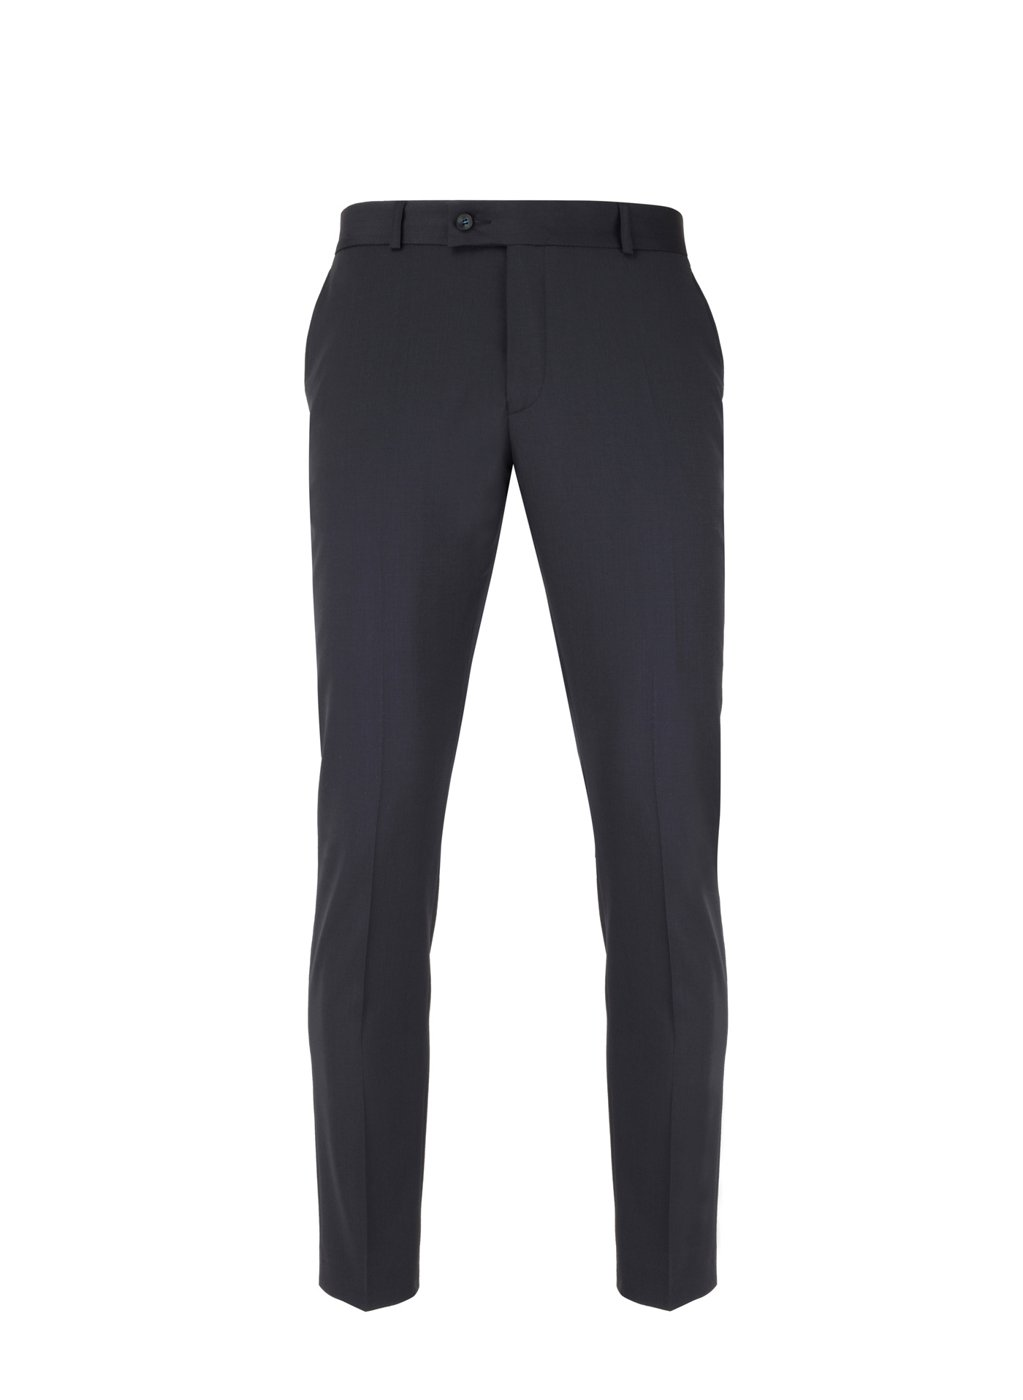 Spodnie męskie garniturowe DRUMMOND PLM-6G-163-G